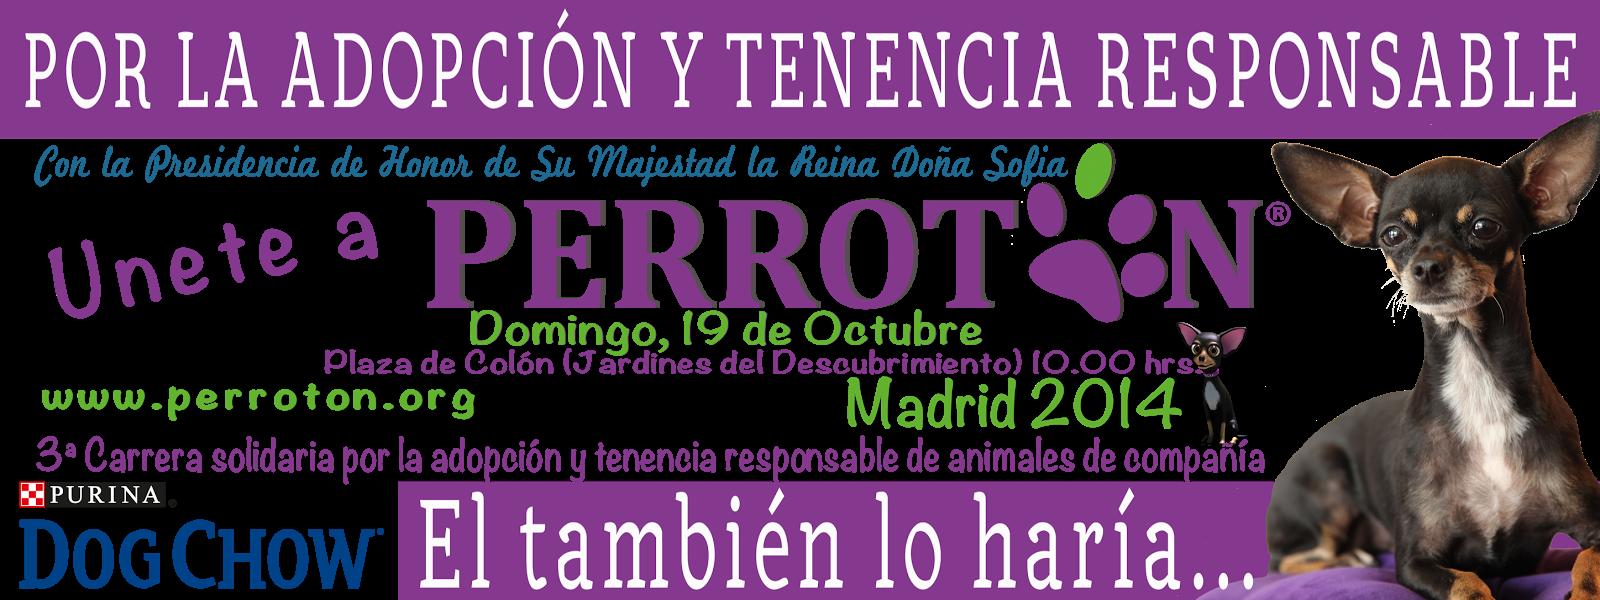 Perrotón - Madrid 2014